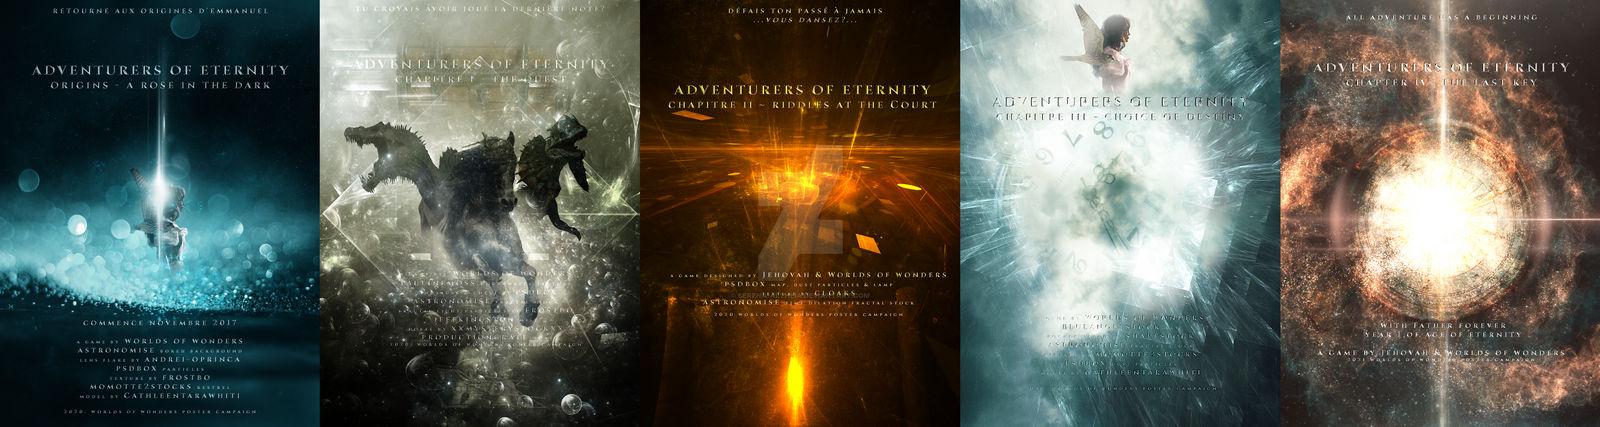 ADVENTURERS OF ETERNITY